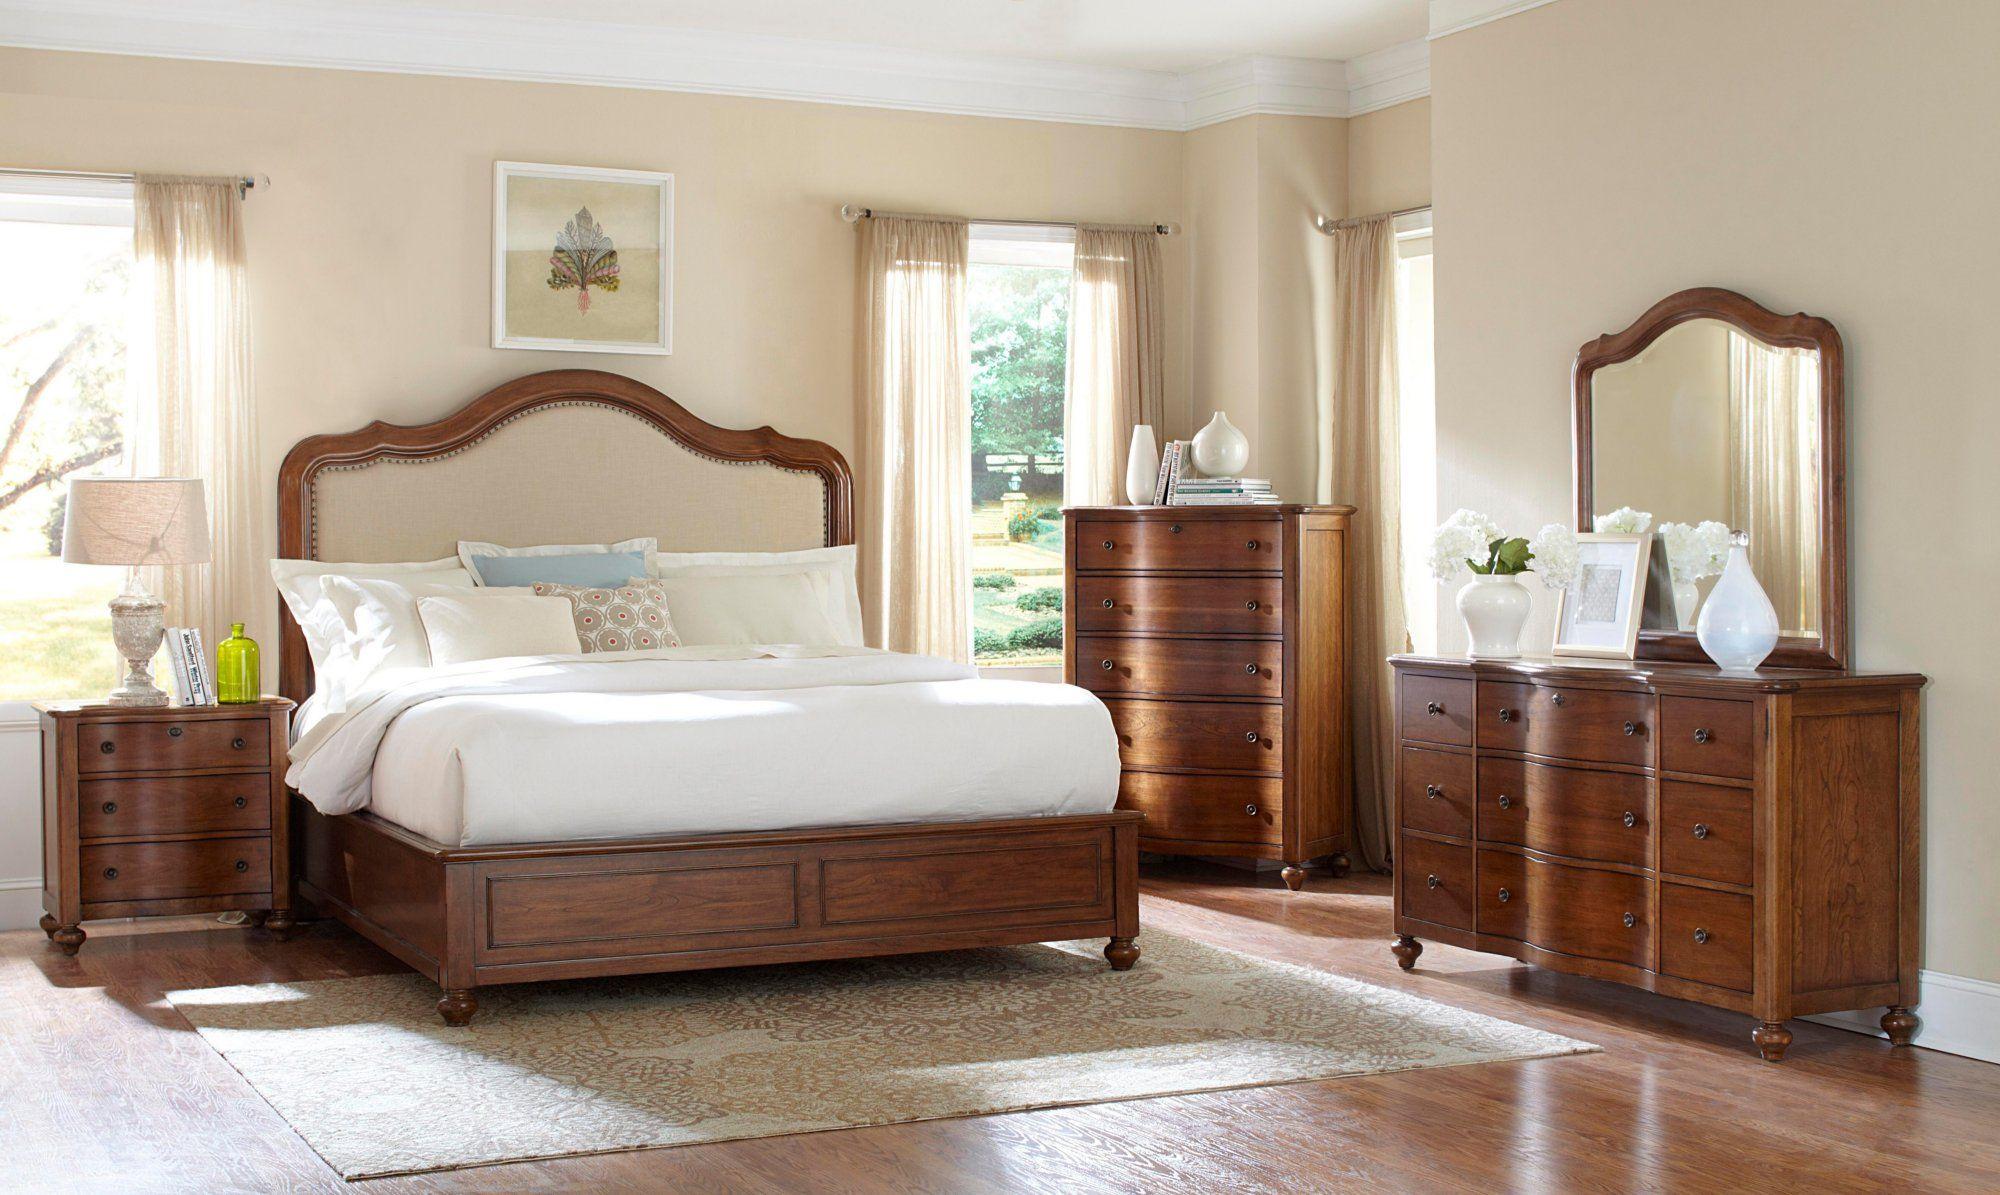 Creswell Bedroom Broyhill Furniture Discontinued Broyhill 4818kpbn9dm Creswell King Bedroom Sets